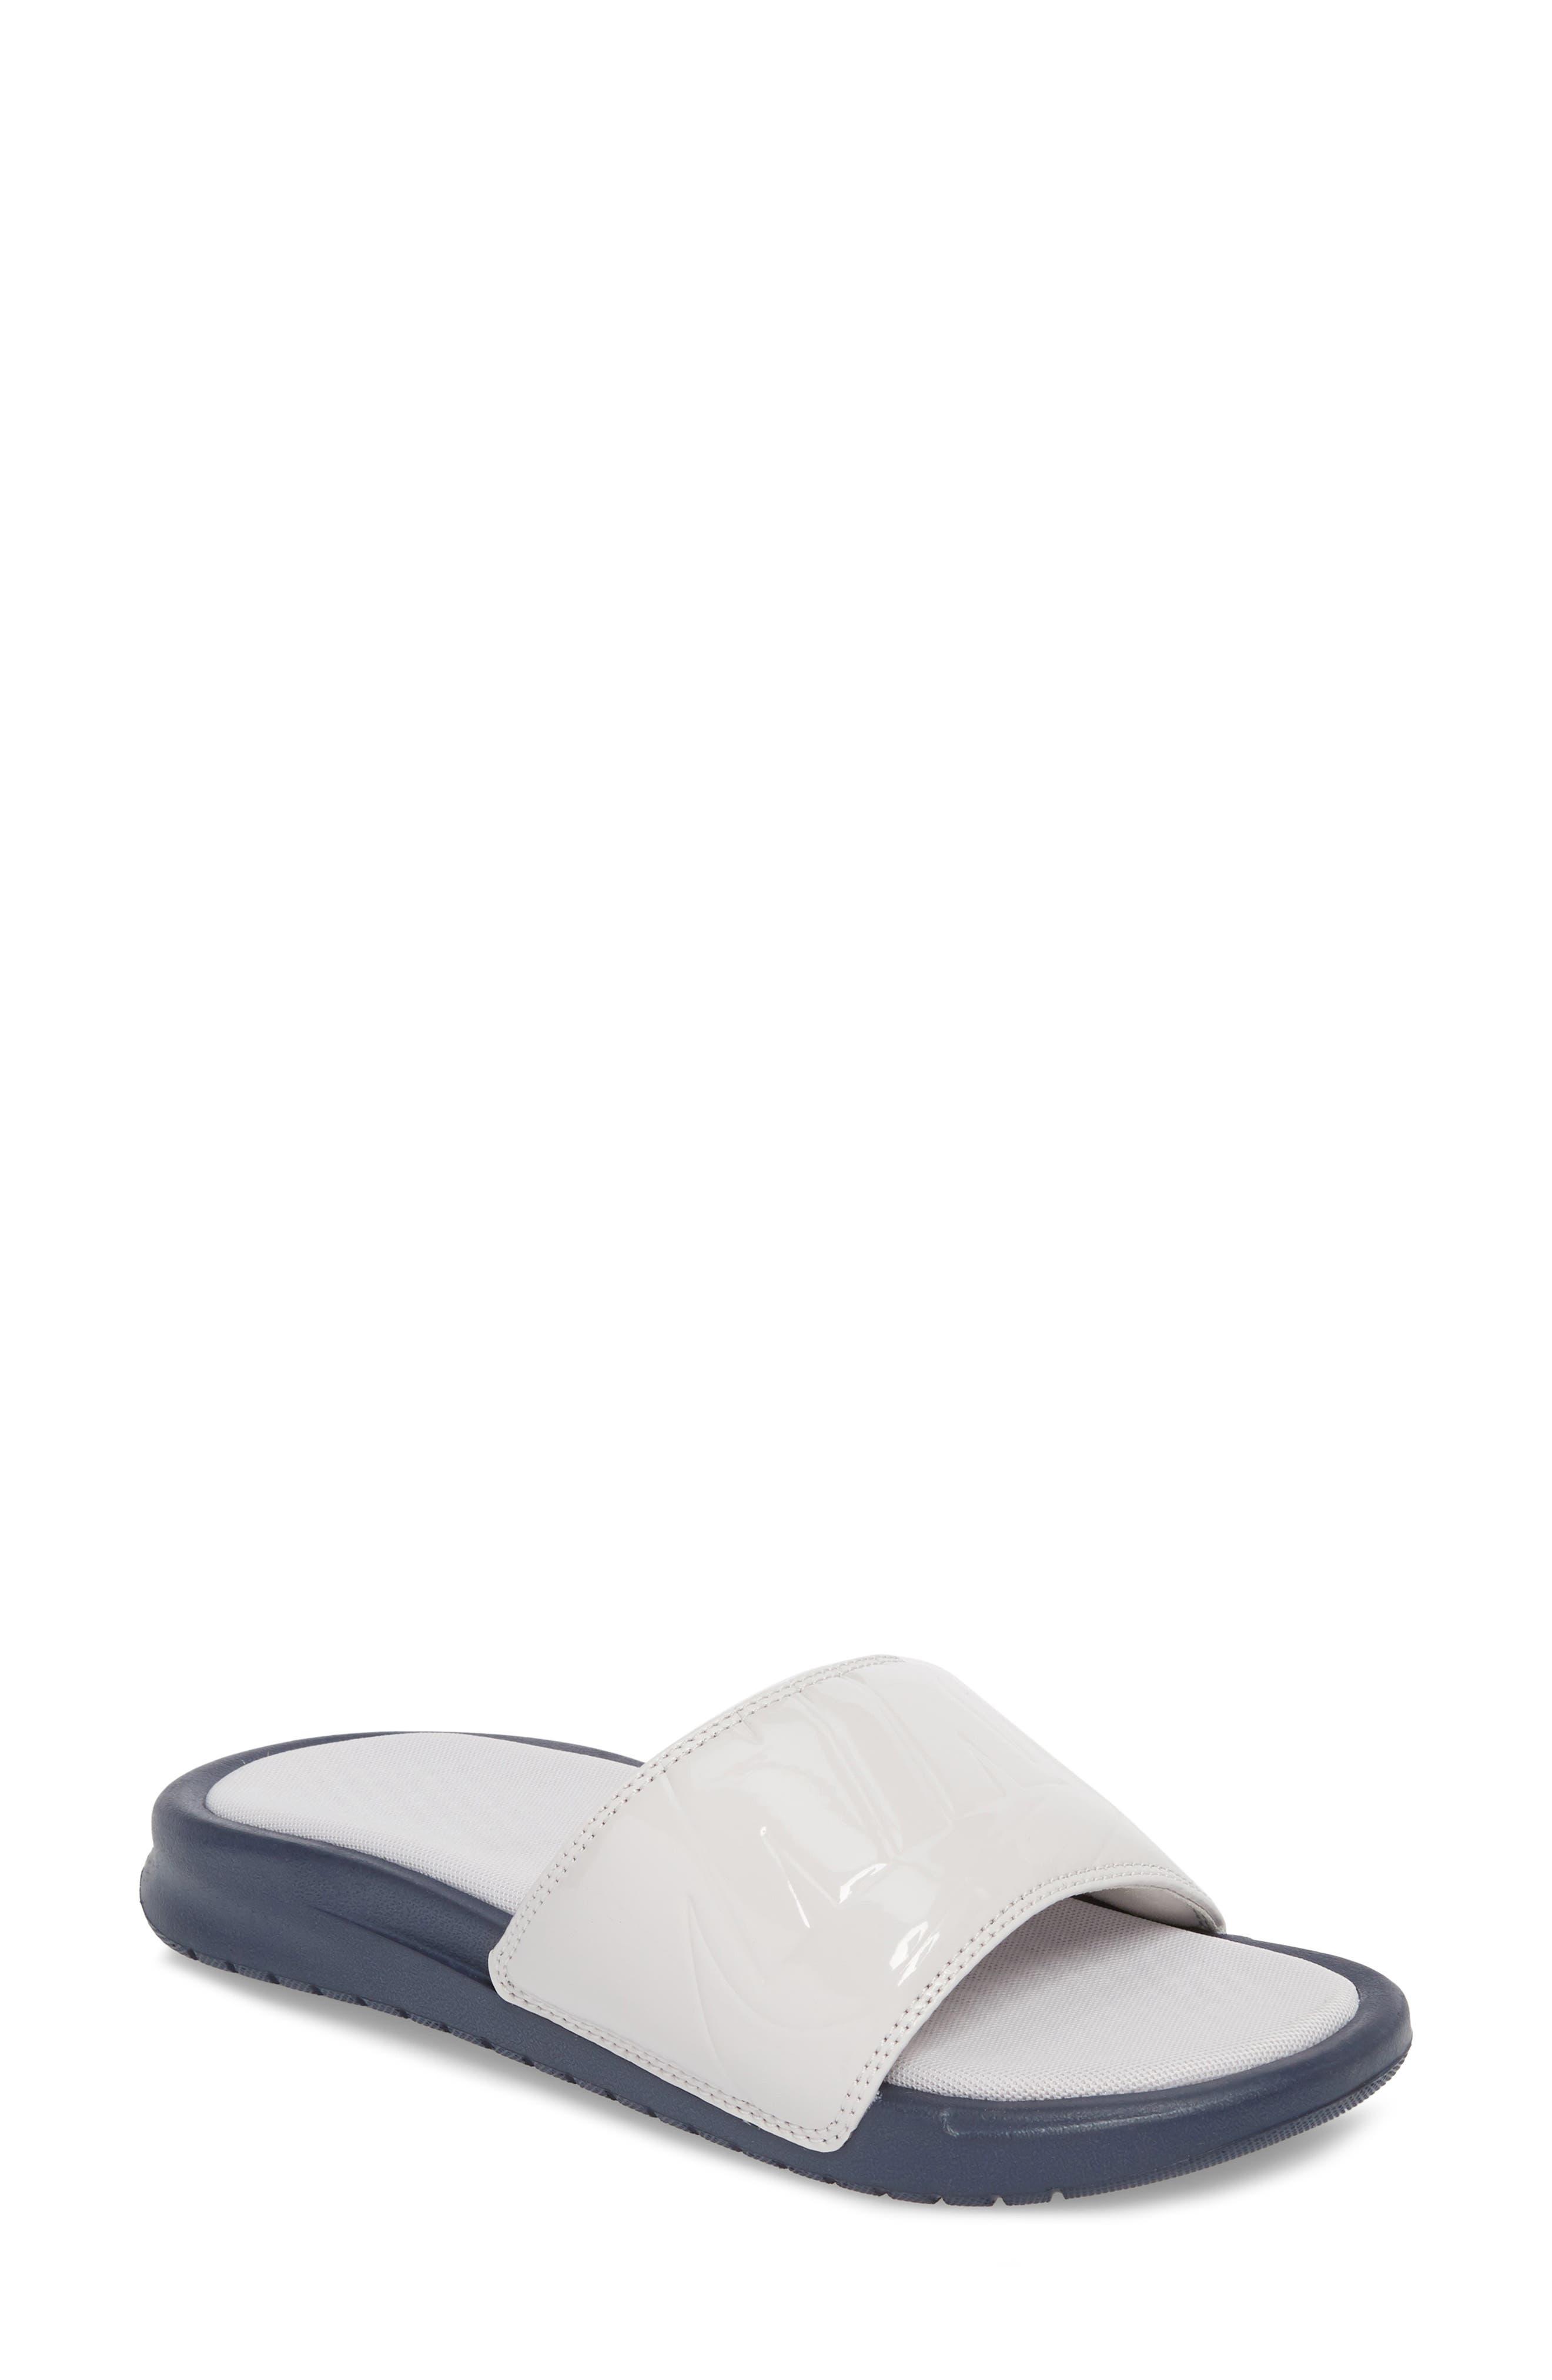 Benassi JDI Ultra Sport Slide,                         Main,                         color, VAST GREY/ VAST GREY/ OBSIDIAN